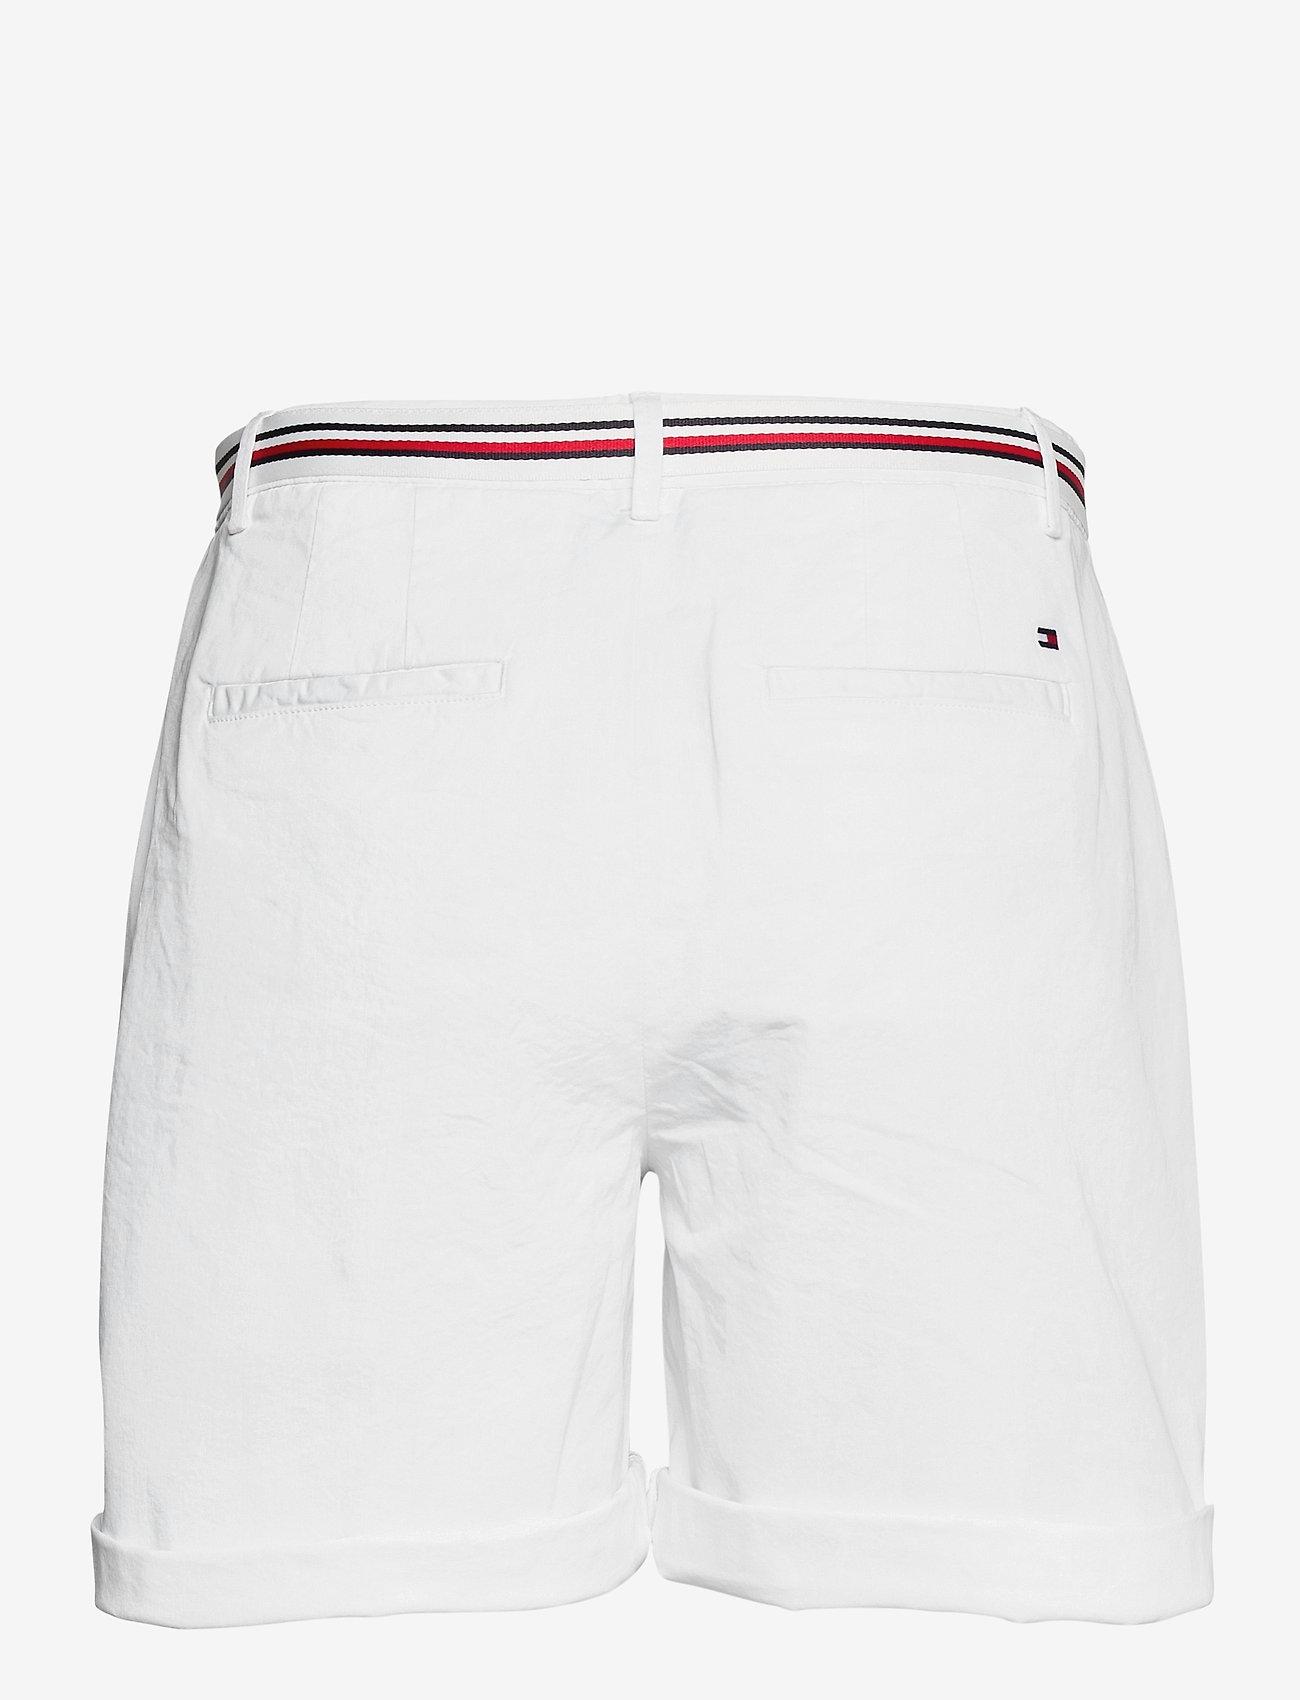 Tommy Hilfiger - COTTON TENCEL CHINO RW SHORT - chino shorts - white - 1